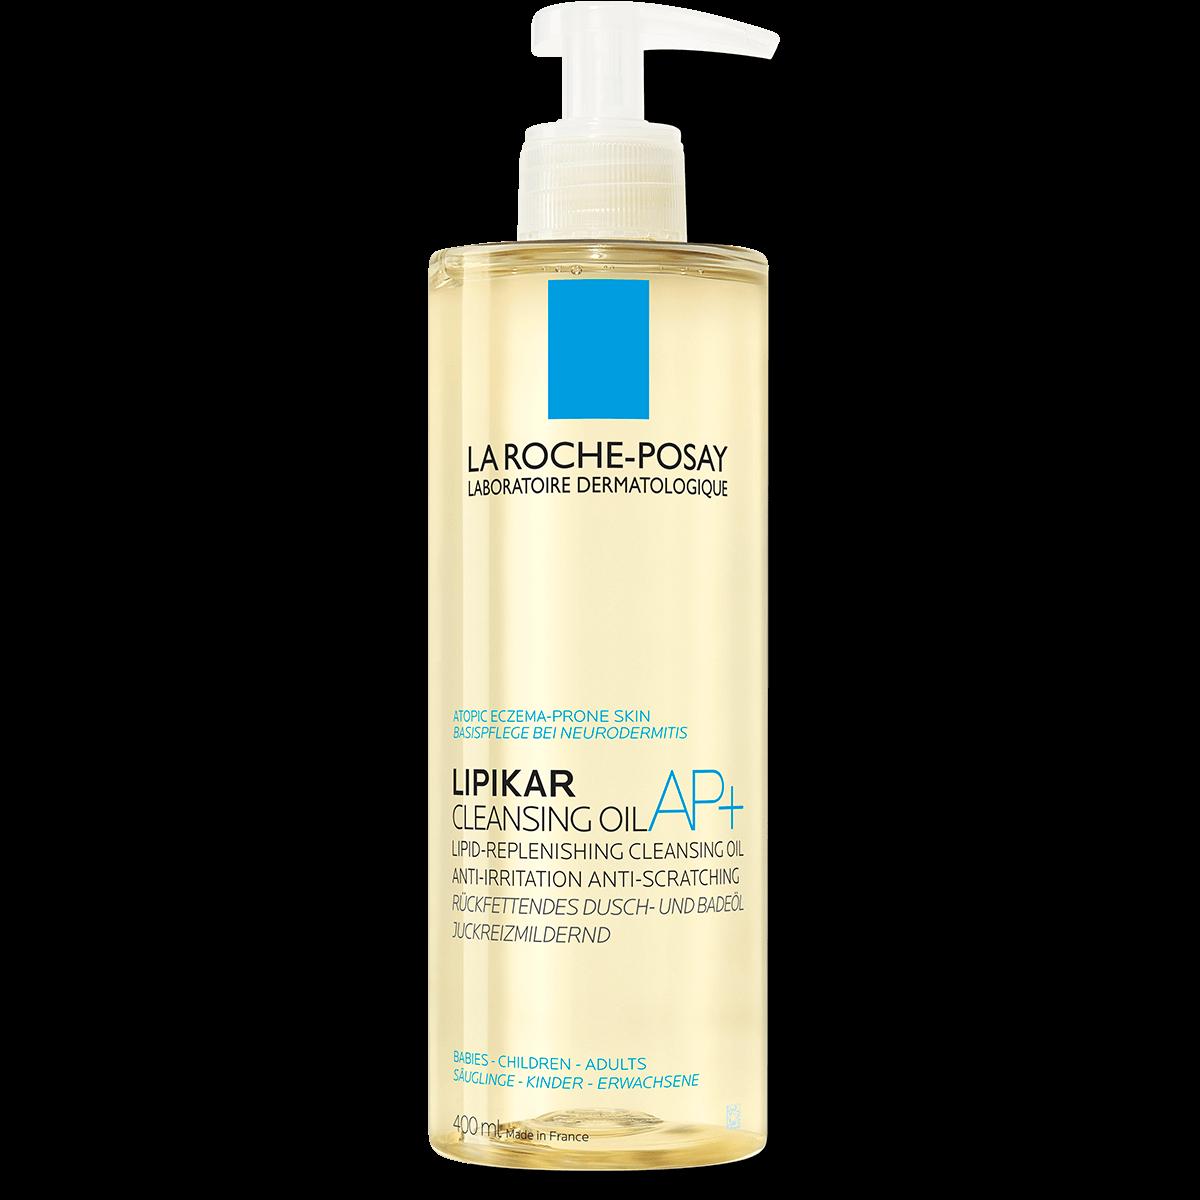 Larocheposay ProductPage Eczema Lipikar Cleansing Oil AP 400ml 3337875